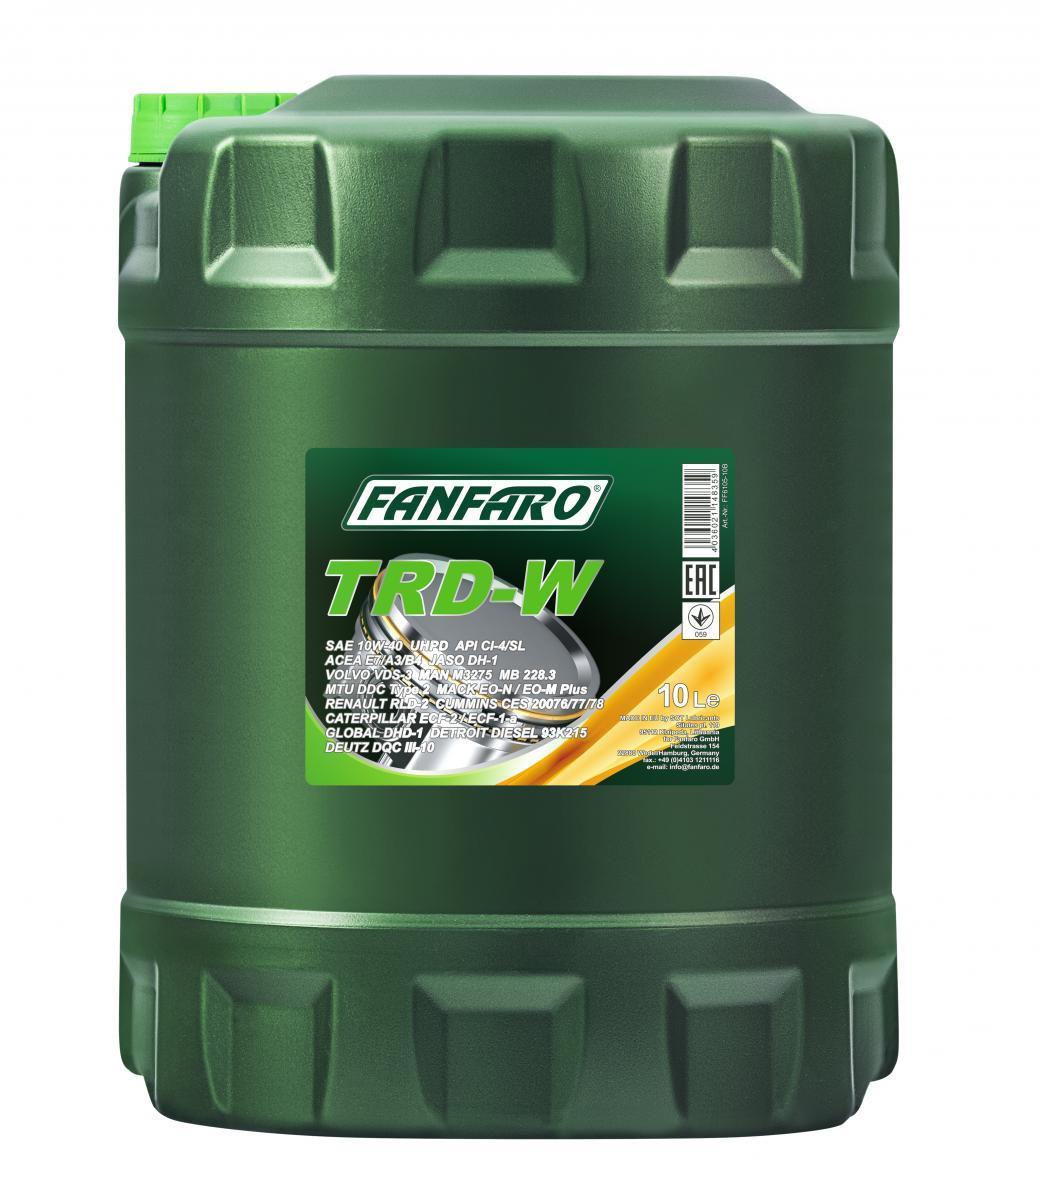 FF6105-10 FANFARO UHPD, TRD-W 10W-40, 10l, Synthetiköl Motoröl FF6105-10 günstig kaufen